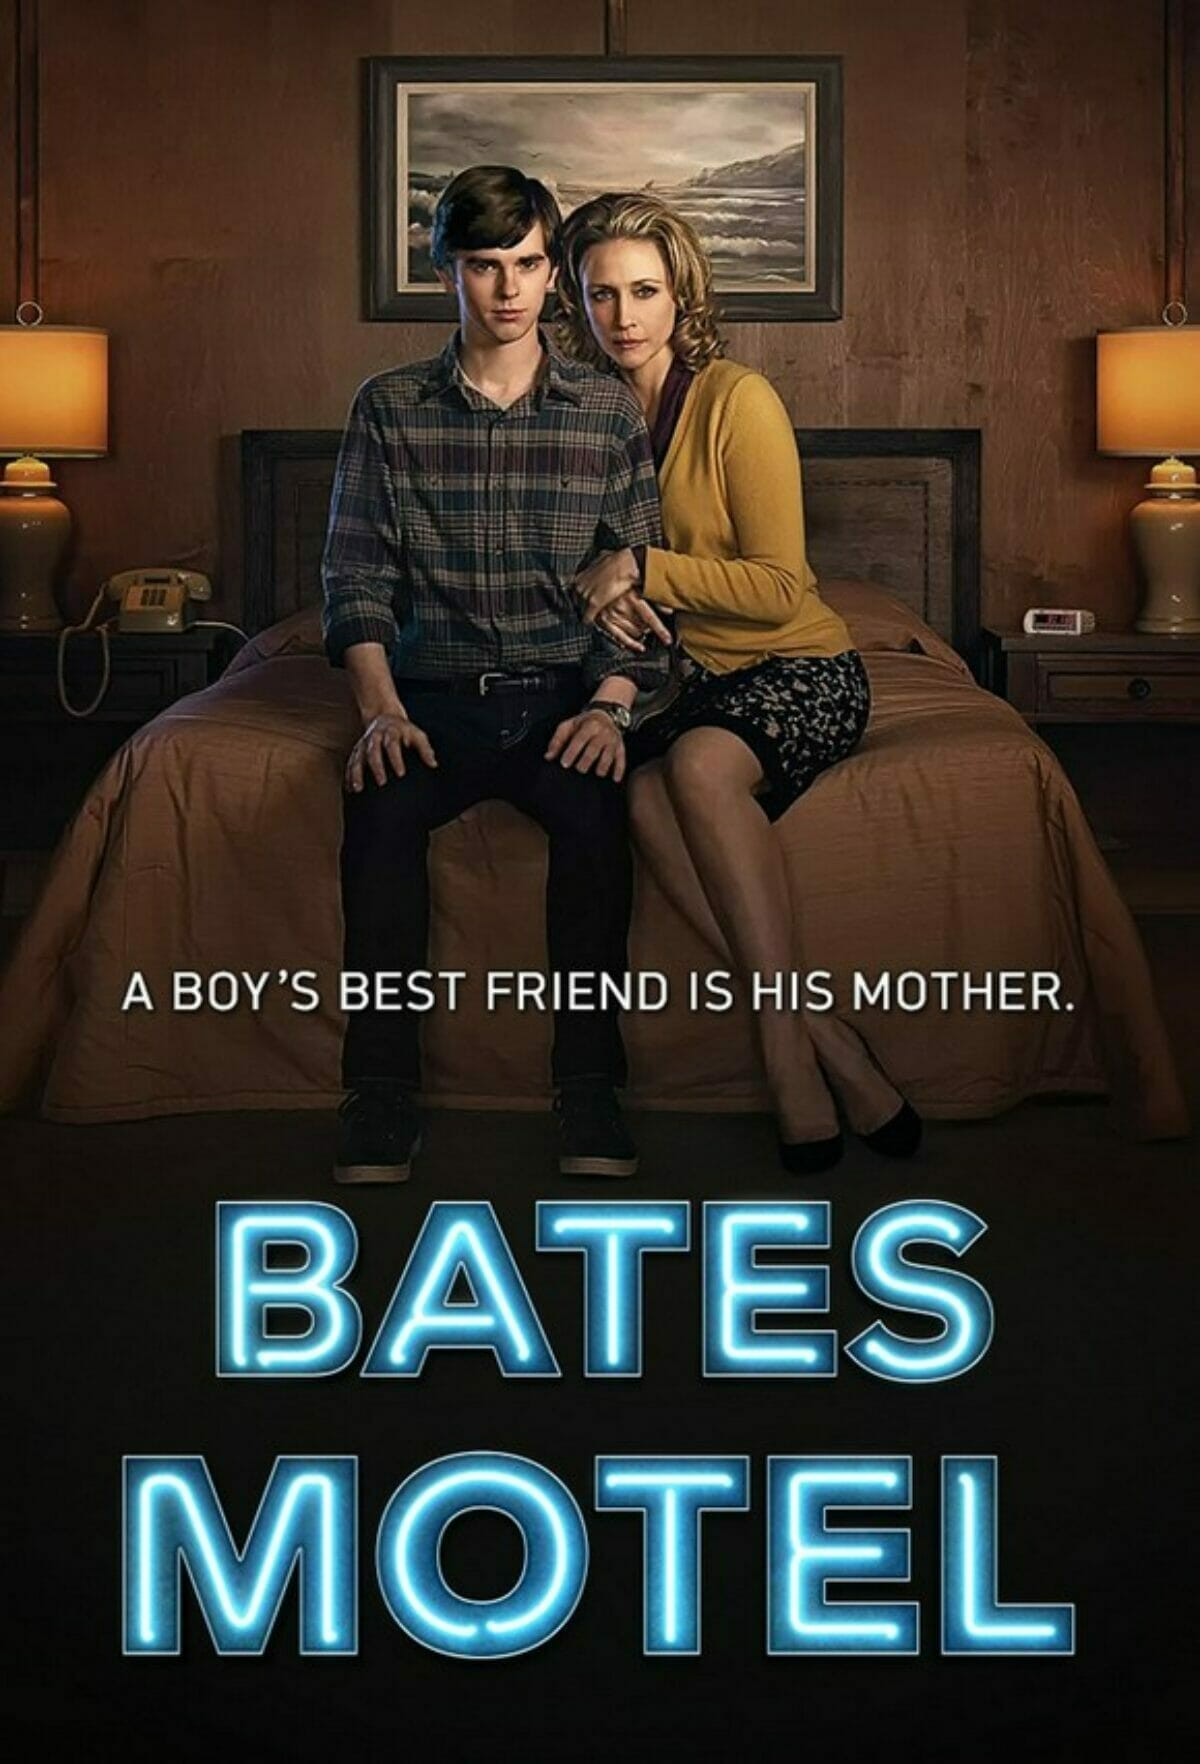 bates-motel-poster-1